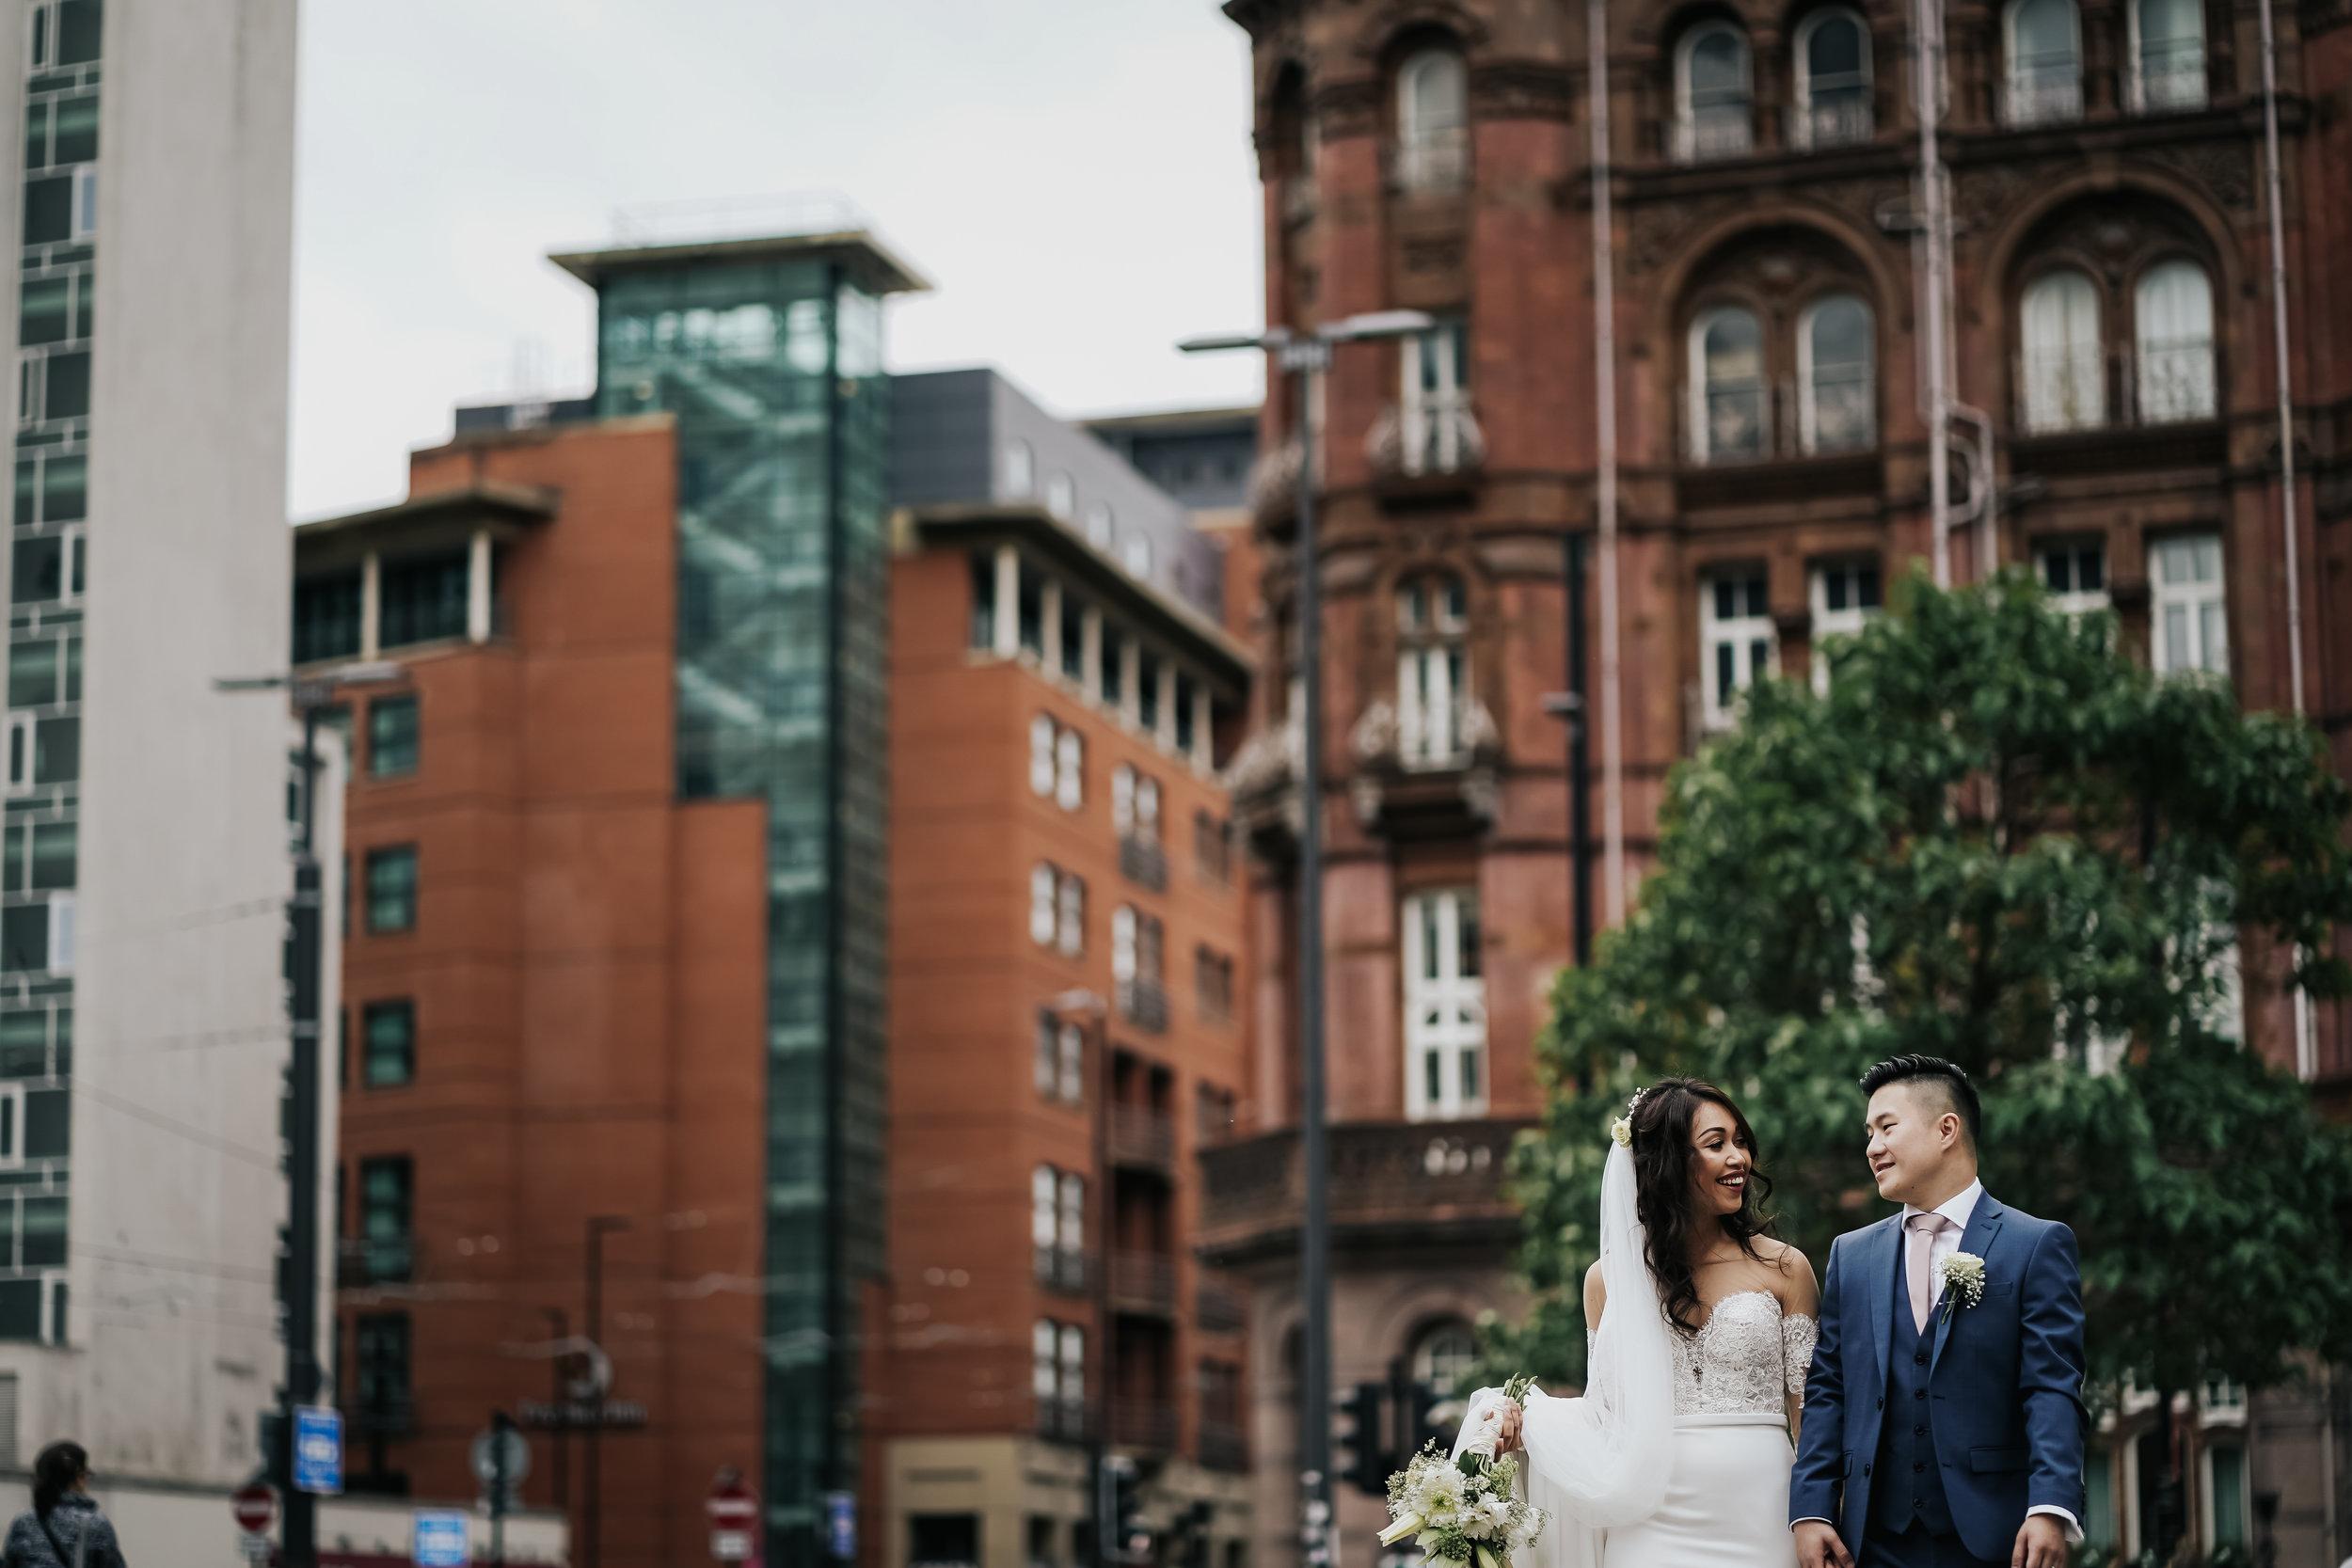 Chinese Wedding Photography Manchester wedding photographer Cheshire - 028.jpg